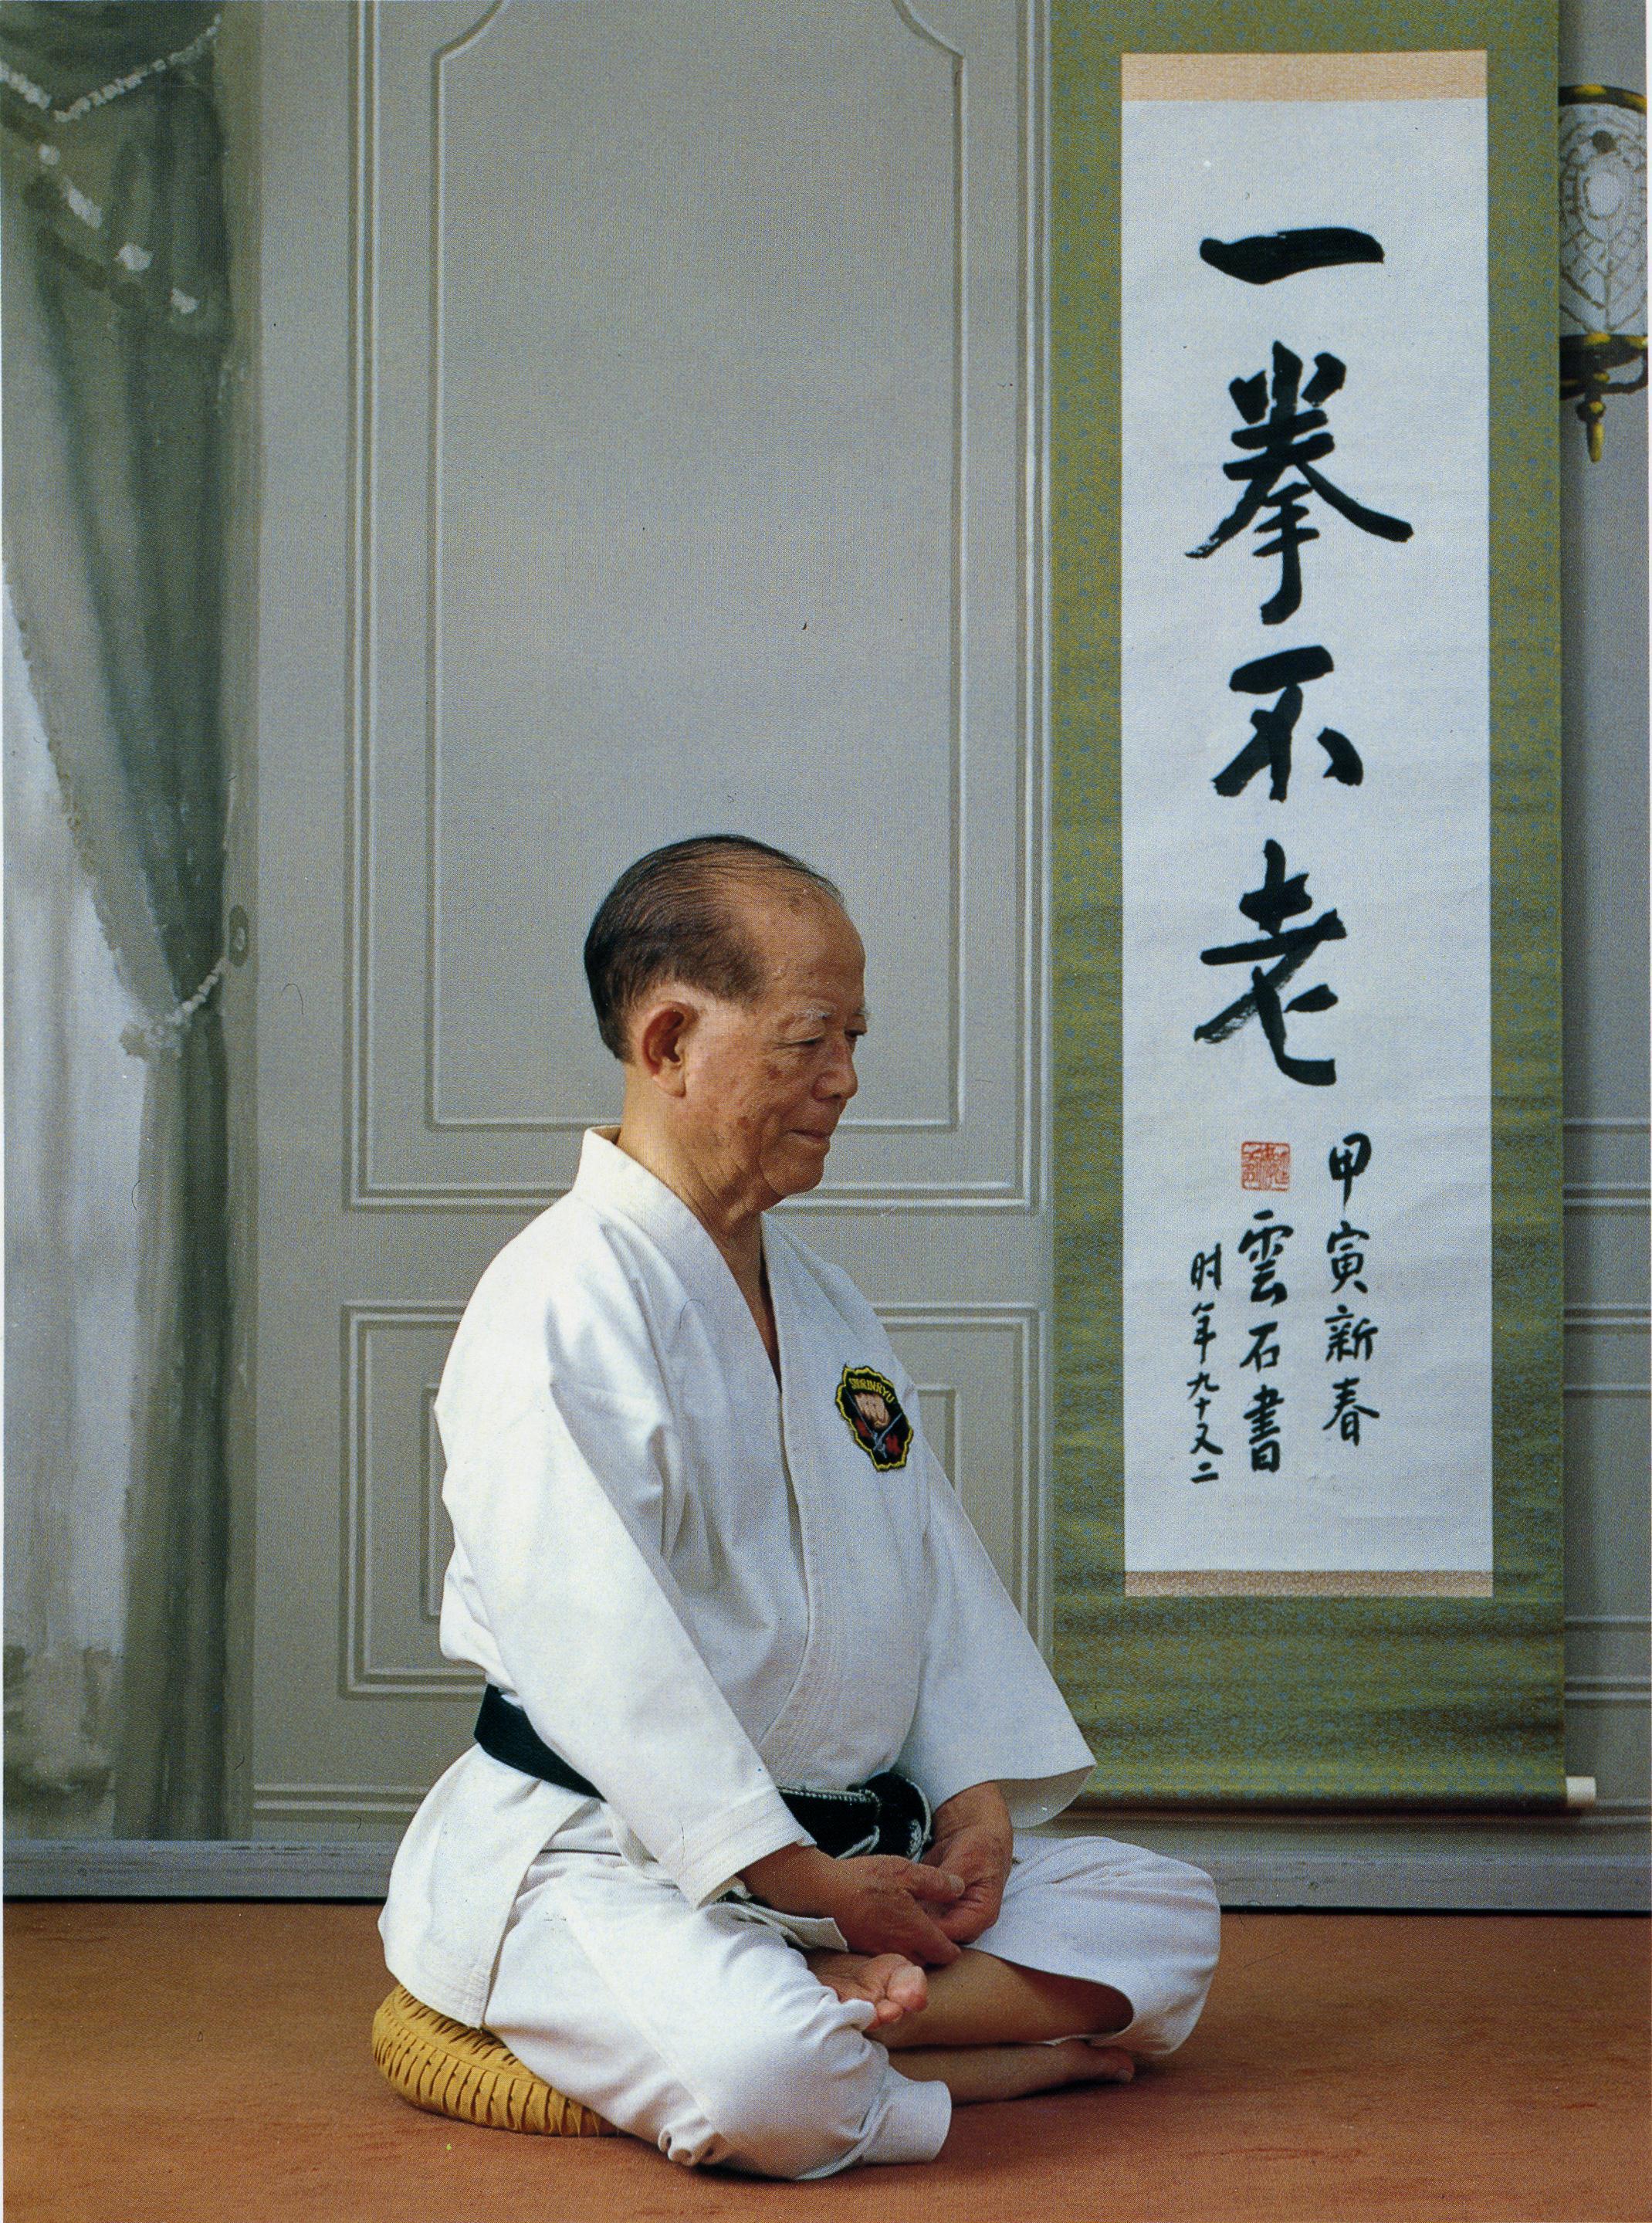 Hanshi in seated Zazen meditation